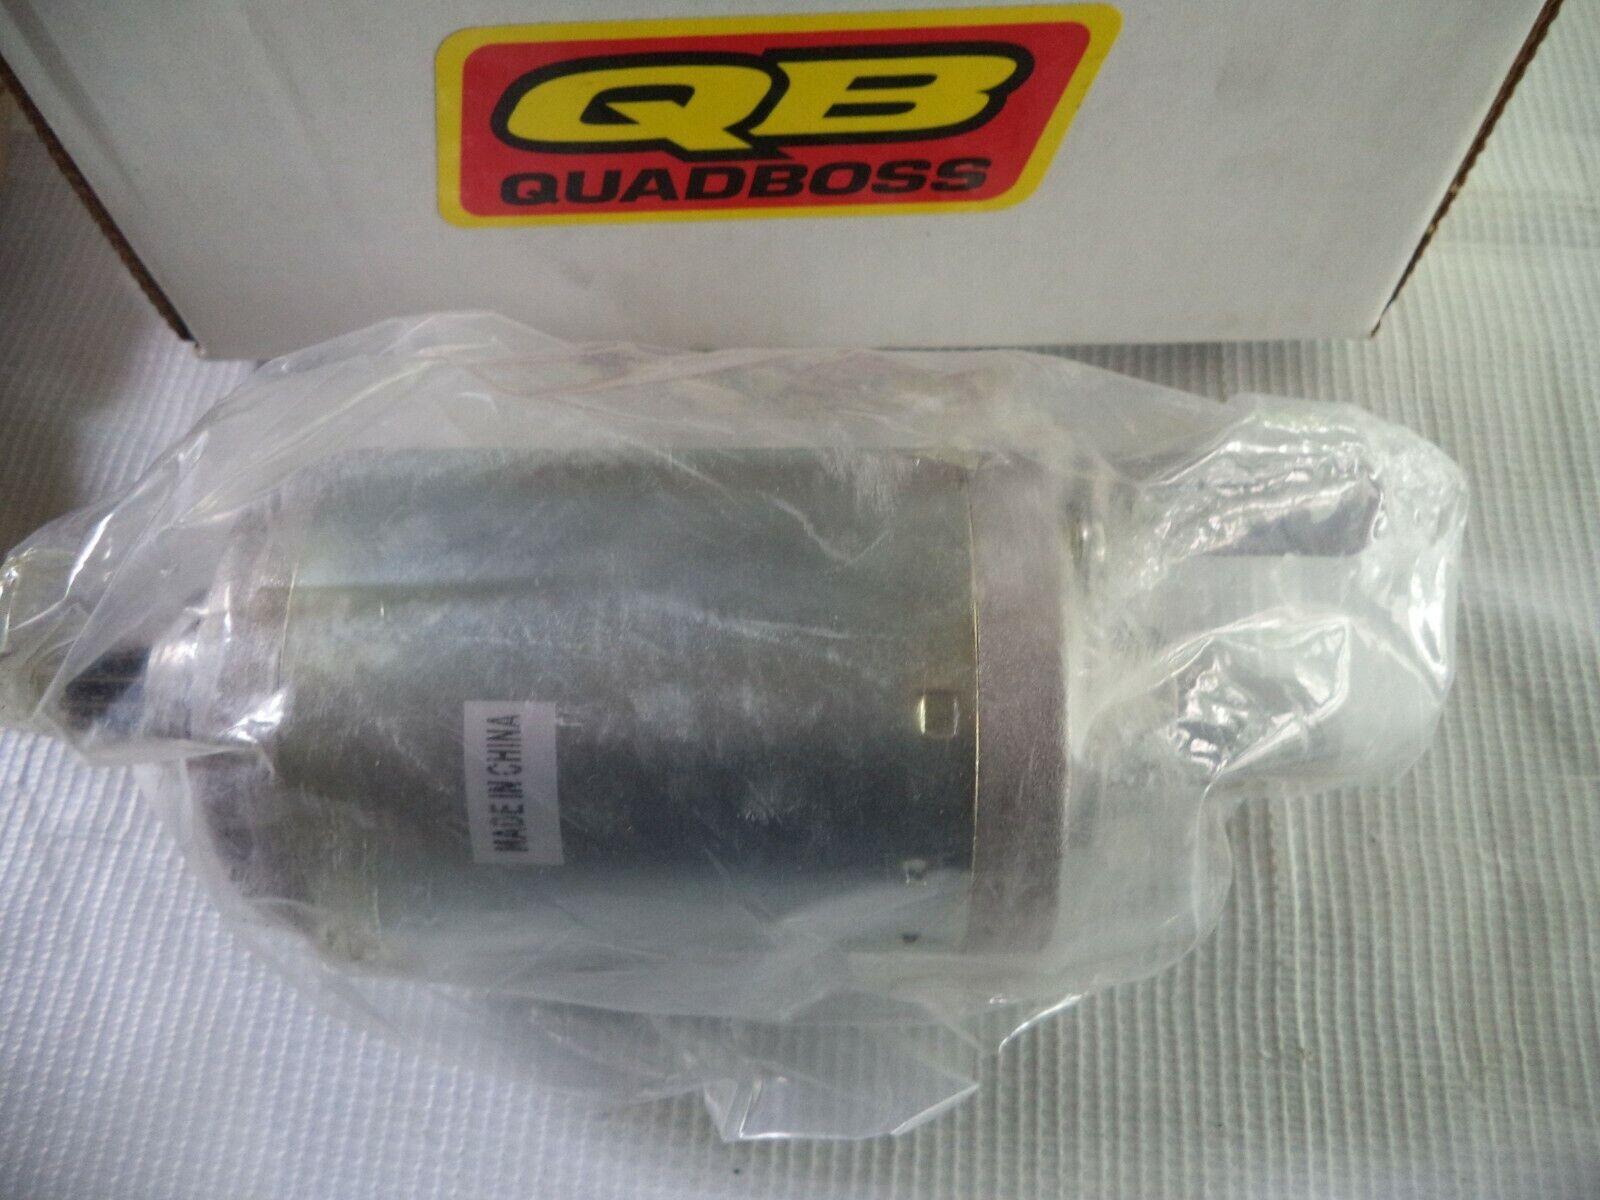 Quadboss Electrical Starter Solenoid for Honda TRX250 Fourtrax 1985-1986